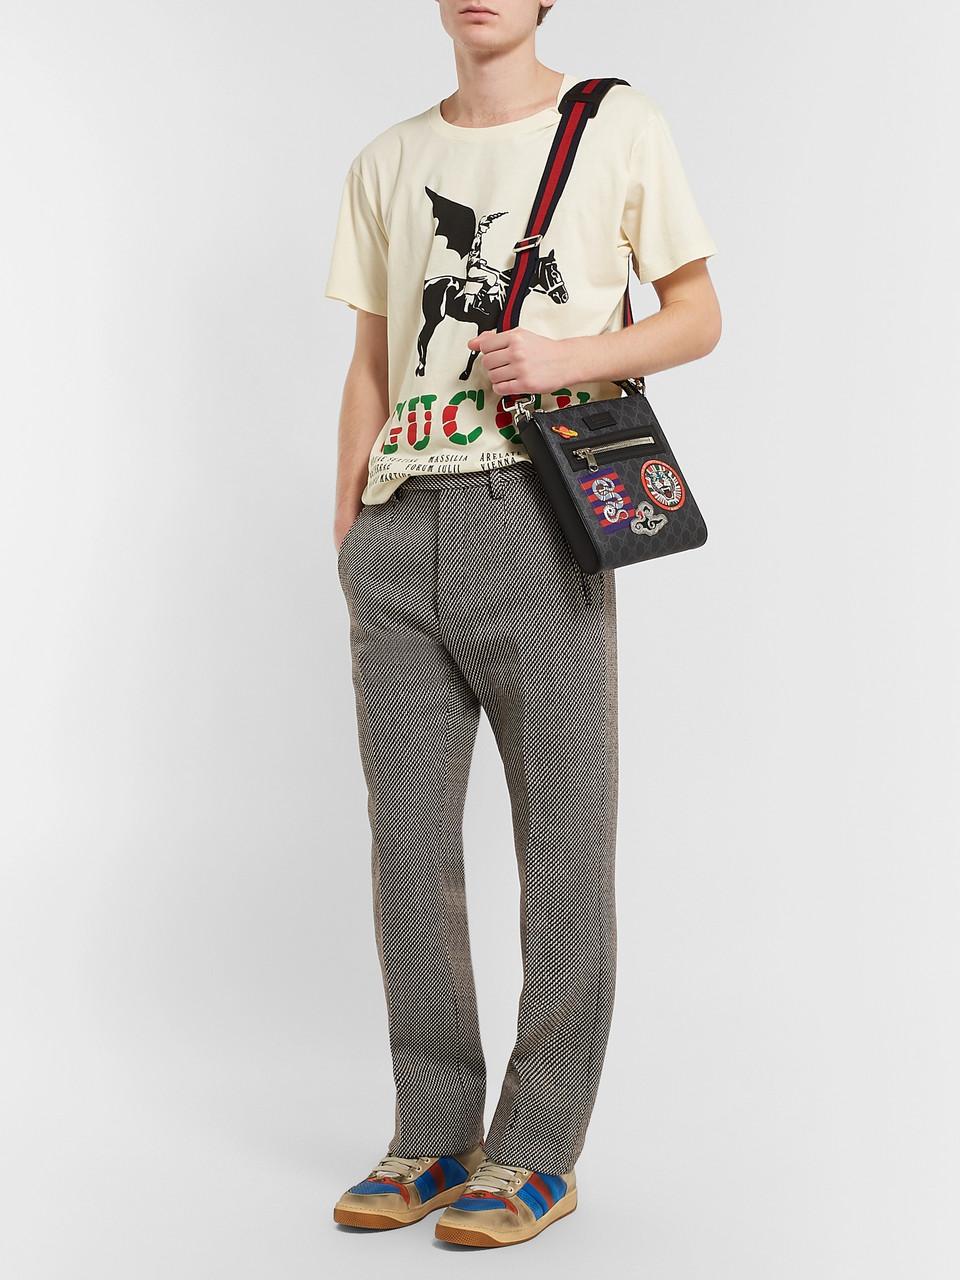 4ac1192c452201 Gucci Night Courrier Leather-Trimmed Appliquéd Monogrammed Coated-Canvas  Messenger Bag